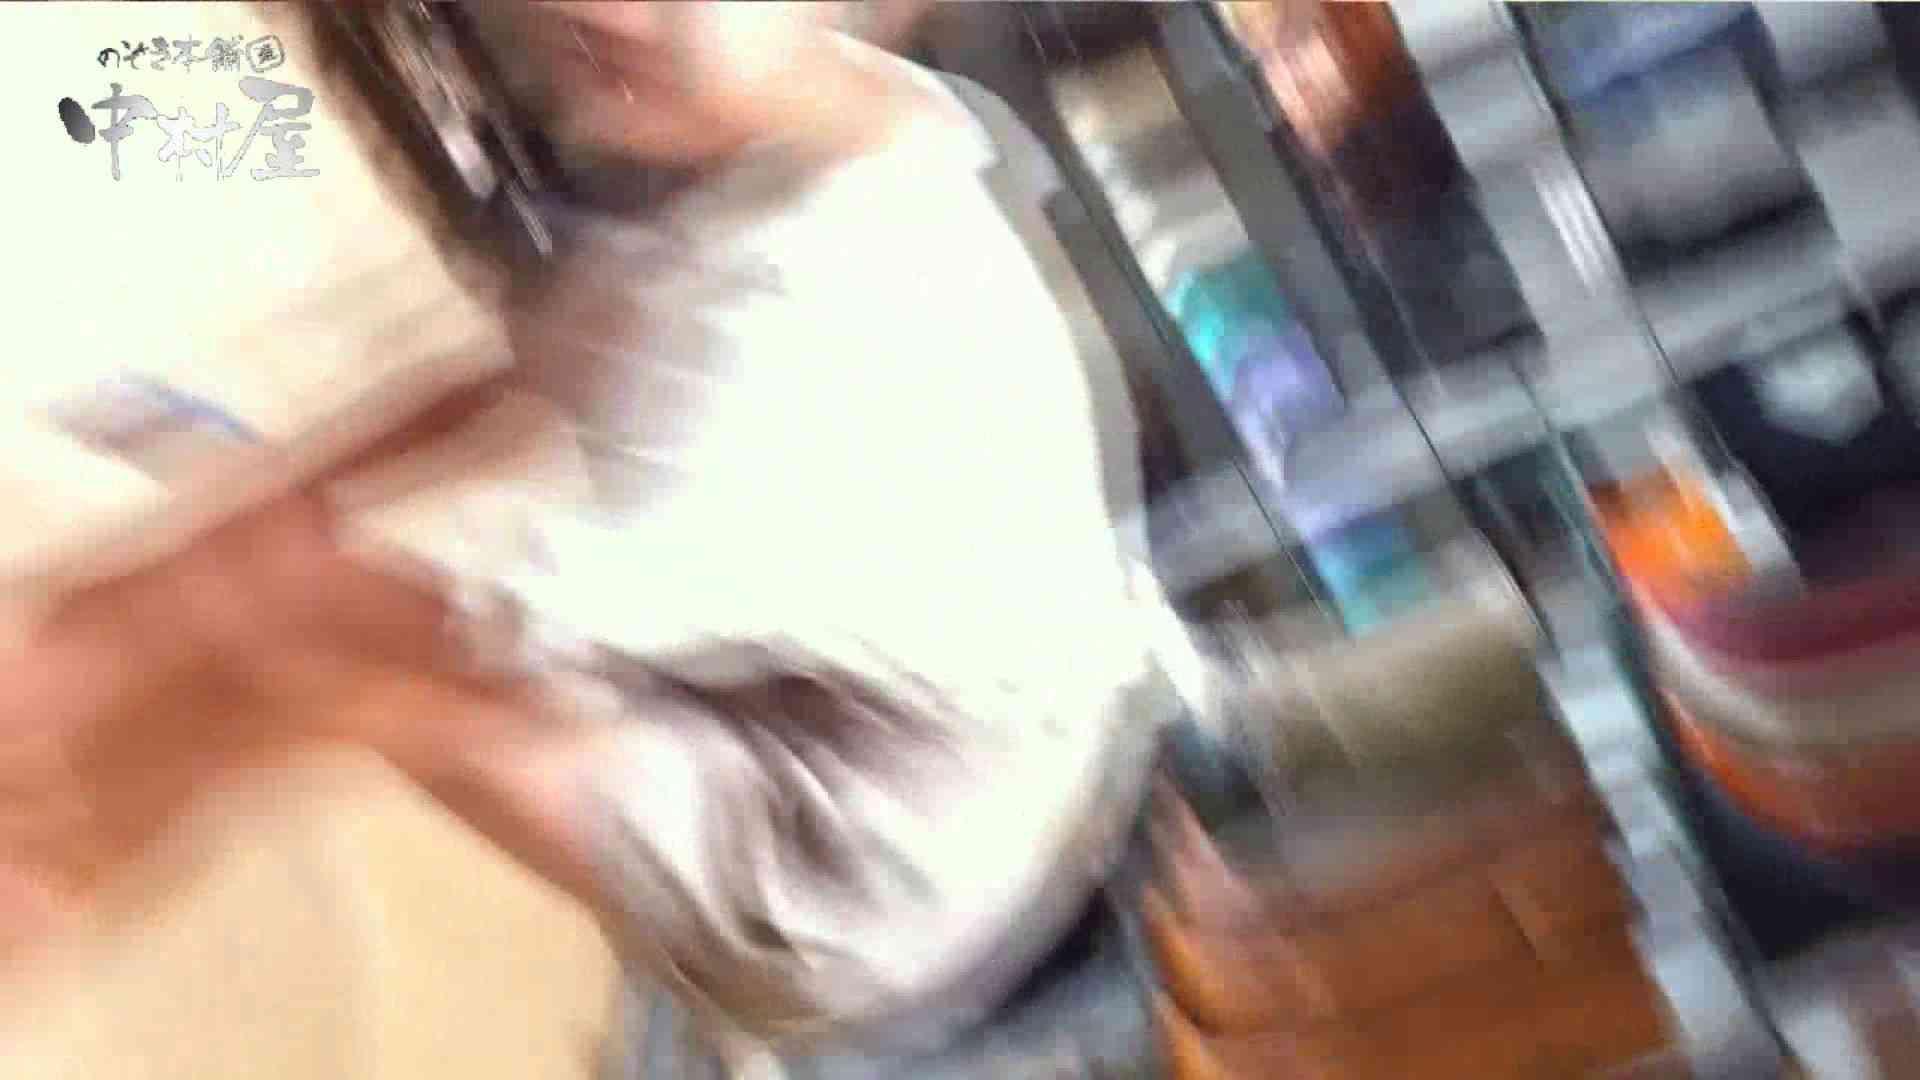 vol.47 カリスマ店員胸チラ&パンチラ 黒パン店員さん パンチラ 盗撮動画紹介 79連発 78